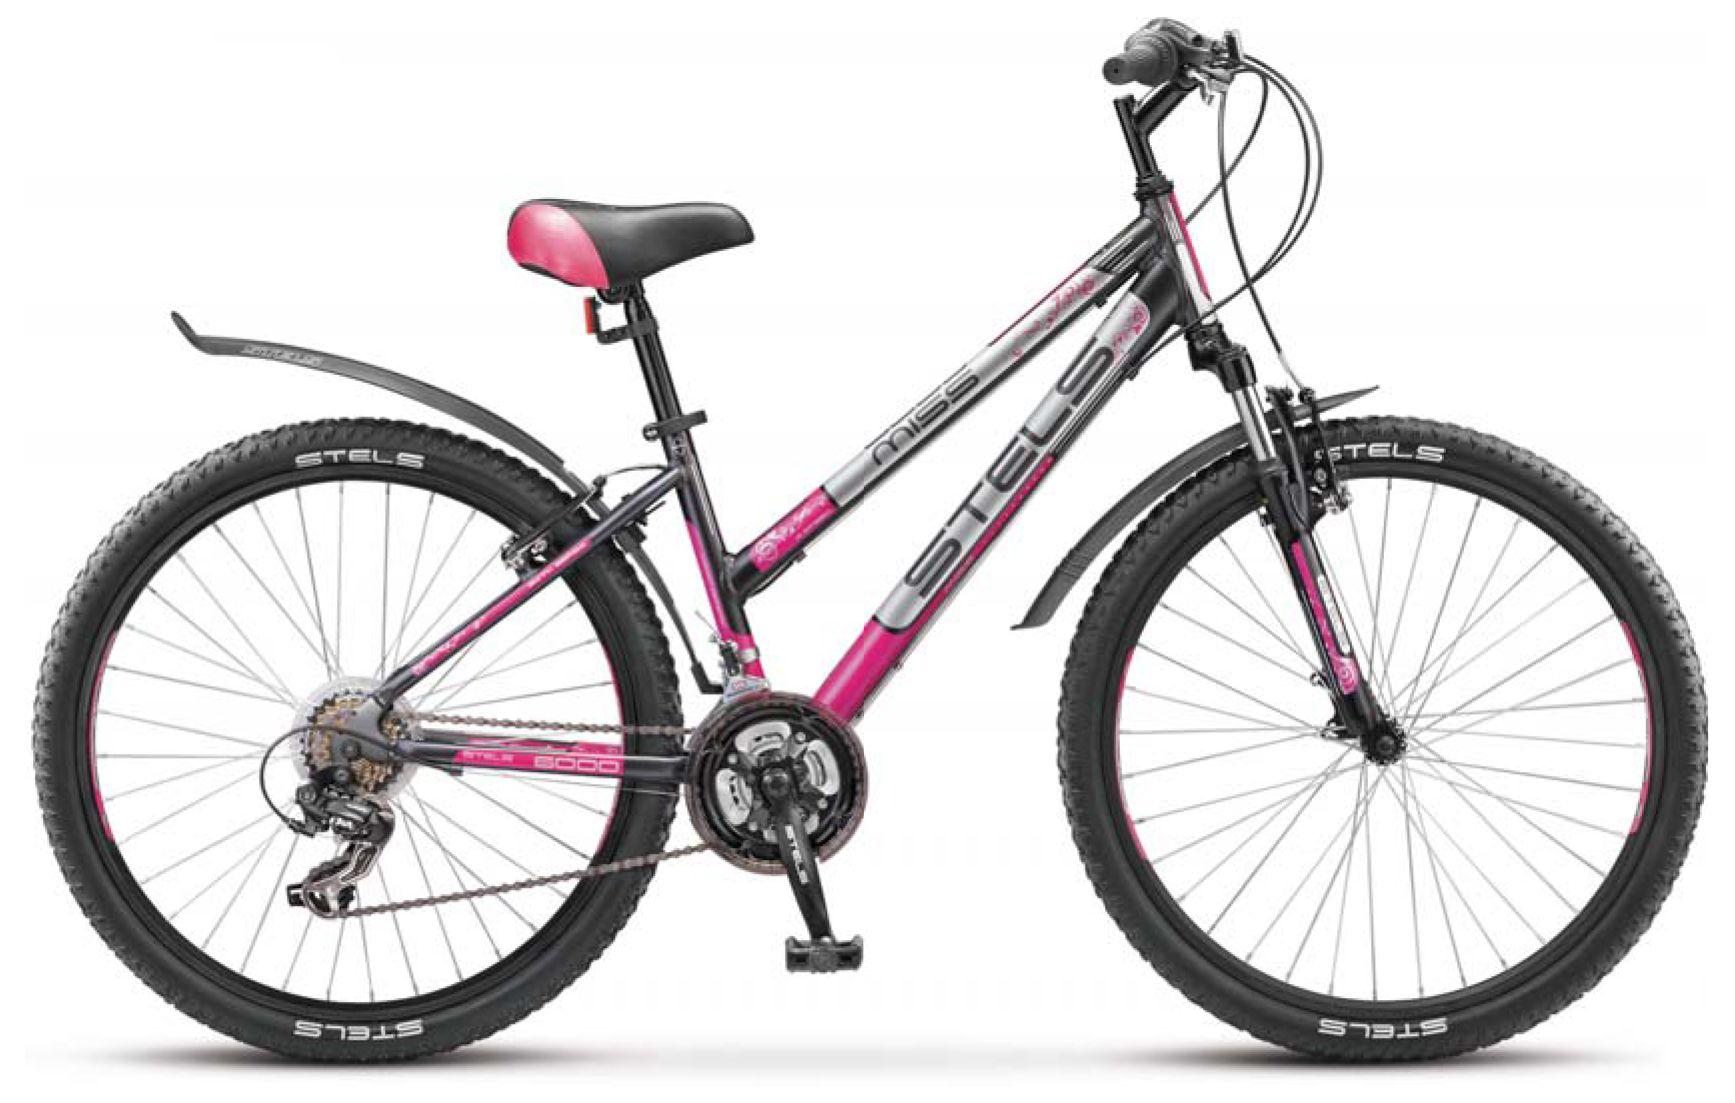 Велосипед Stels Miss 6000 V (V010) 2017,  Горные  - артикул:283134